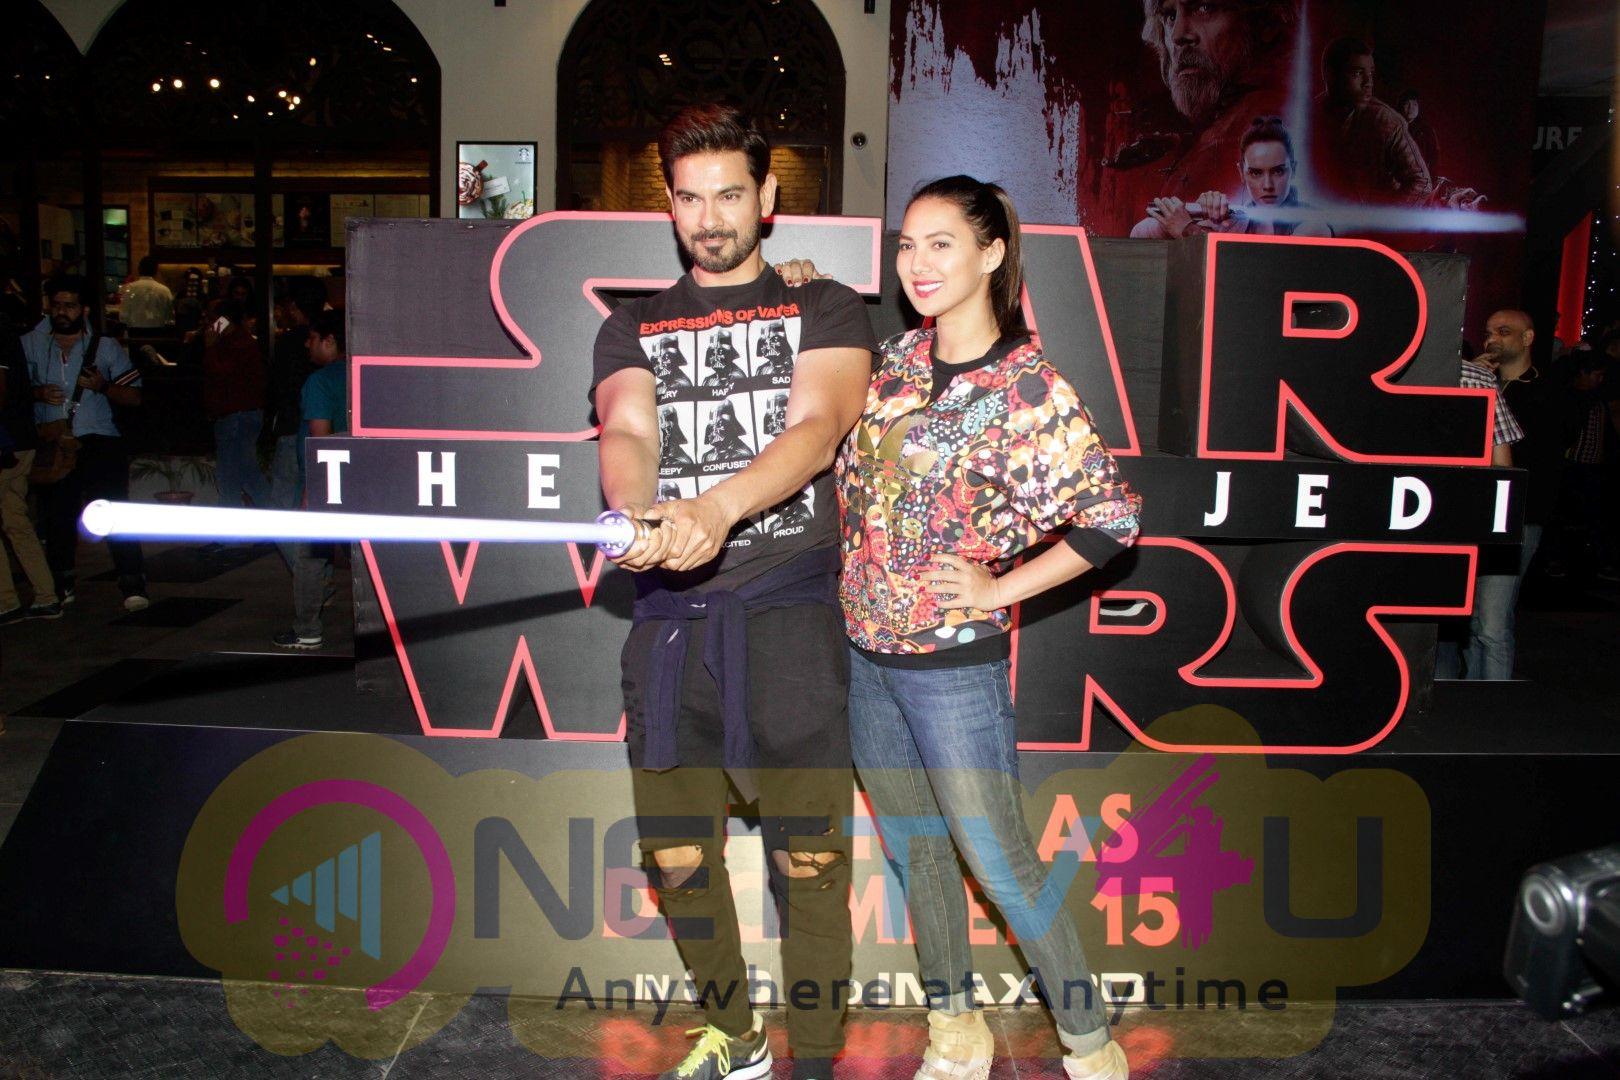 Red Carpet Premiere Of 2017's Most Awaited Hollywood Film Disney Star Wars  Stills